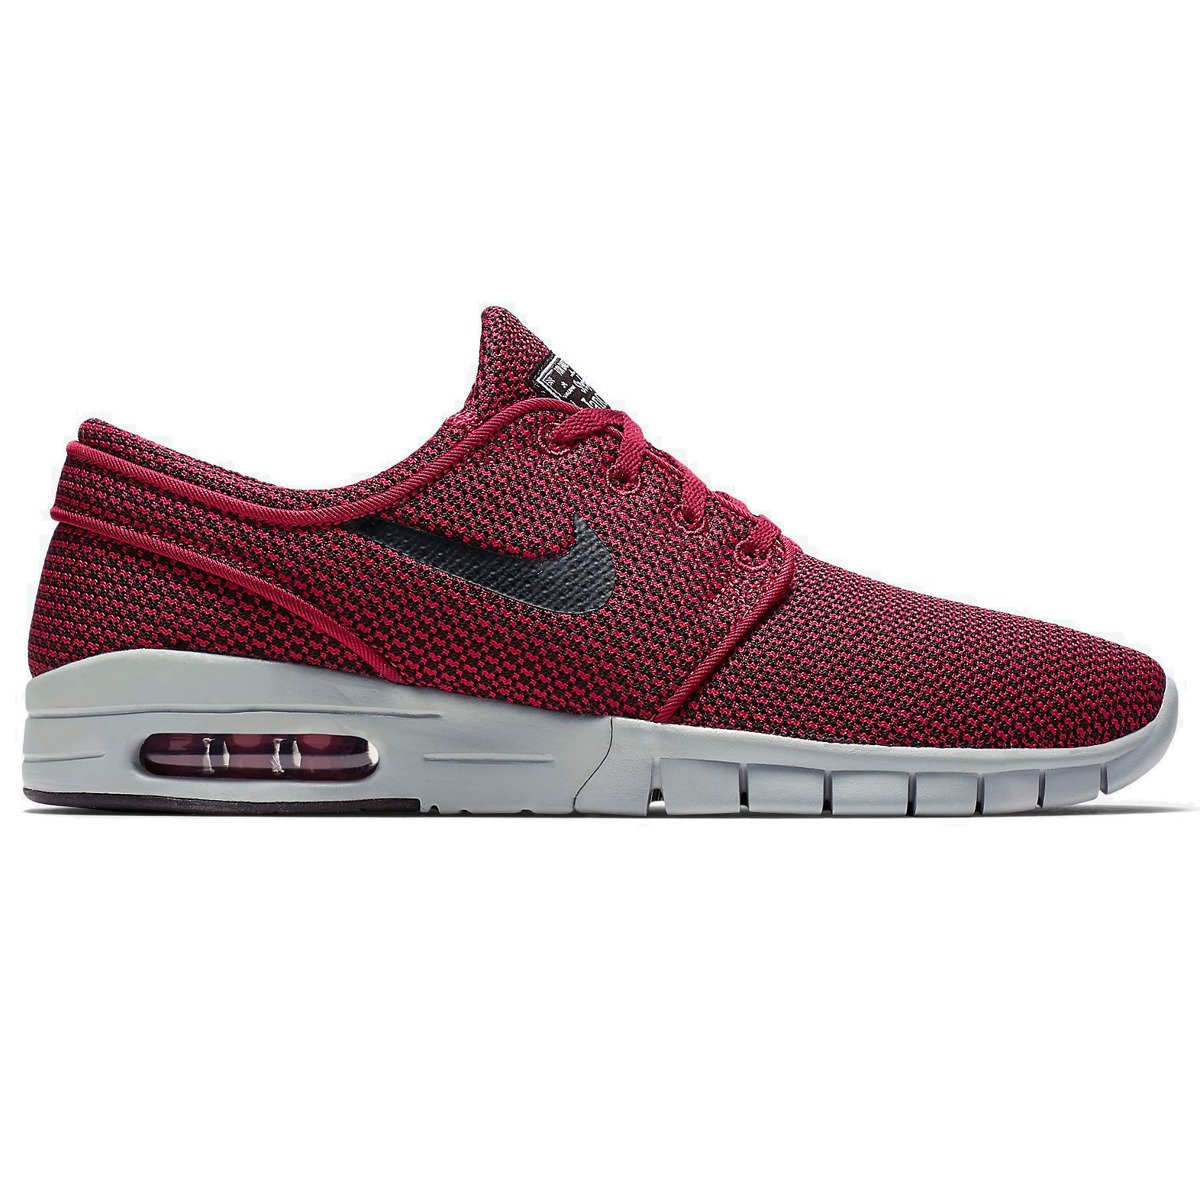 release date: d4889 27da1 Buty Nike SB Stefan Janoski Max TEAM RED BLACK-WOLF GREY red    burgundy    Shoes   Nike SB Shoes   nike janoski SALE   Sale 50% -70%   Shoes Brands    Nike ...